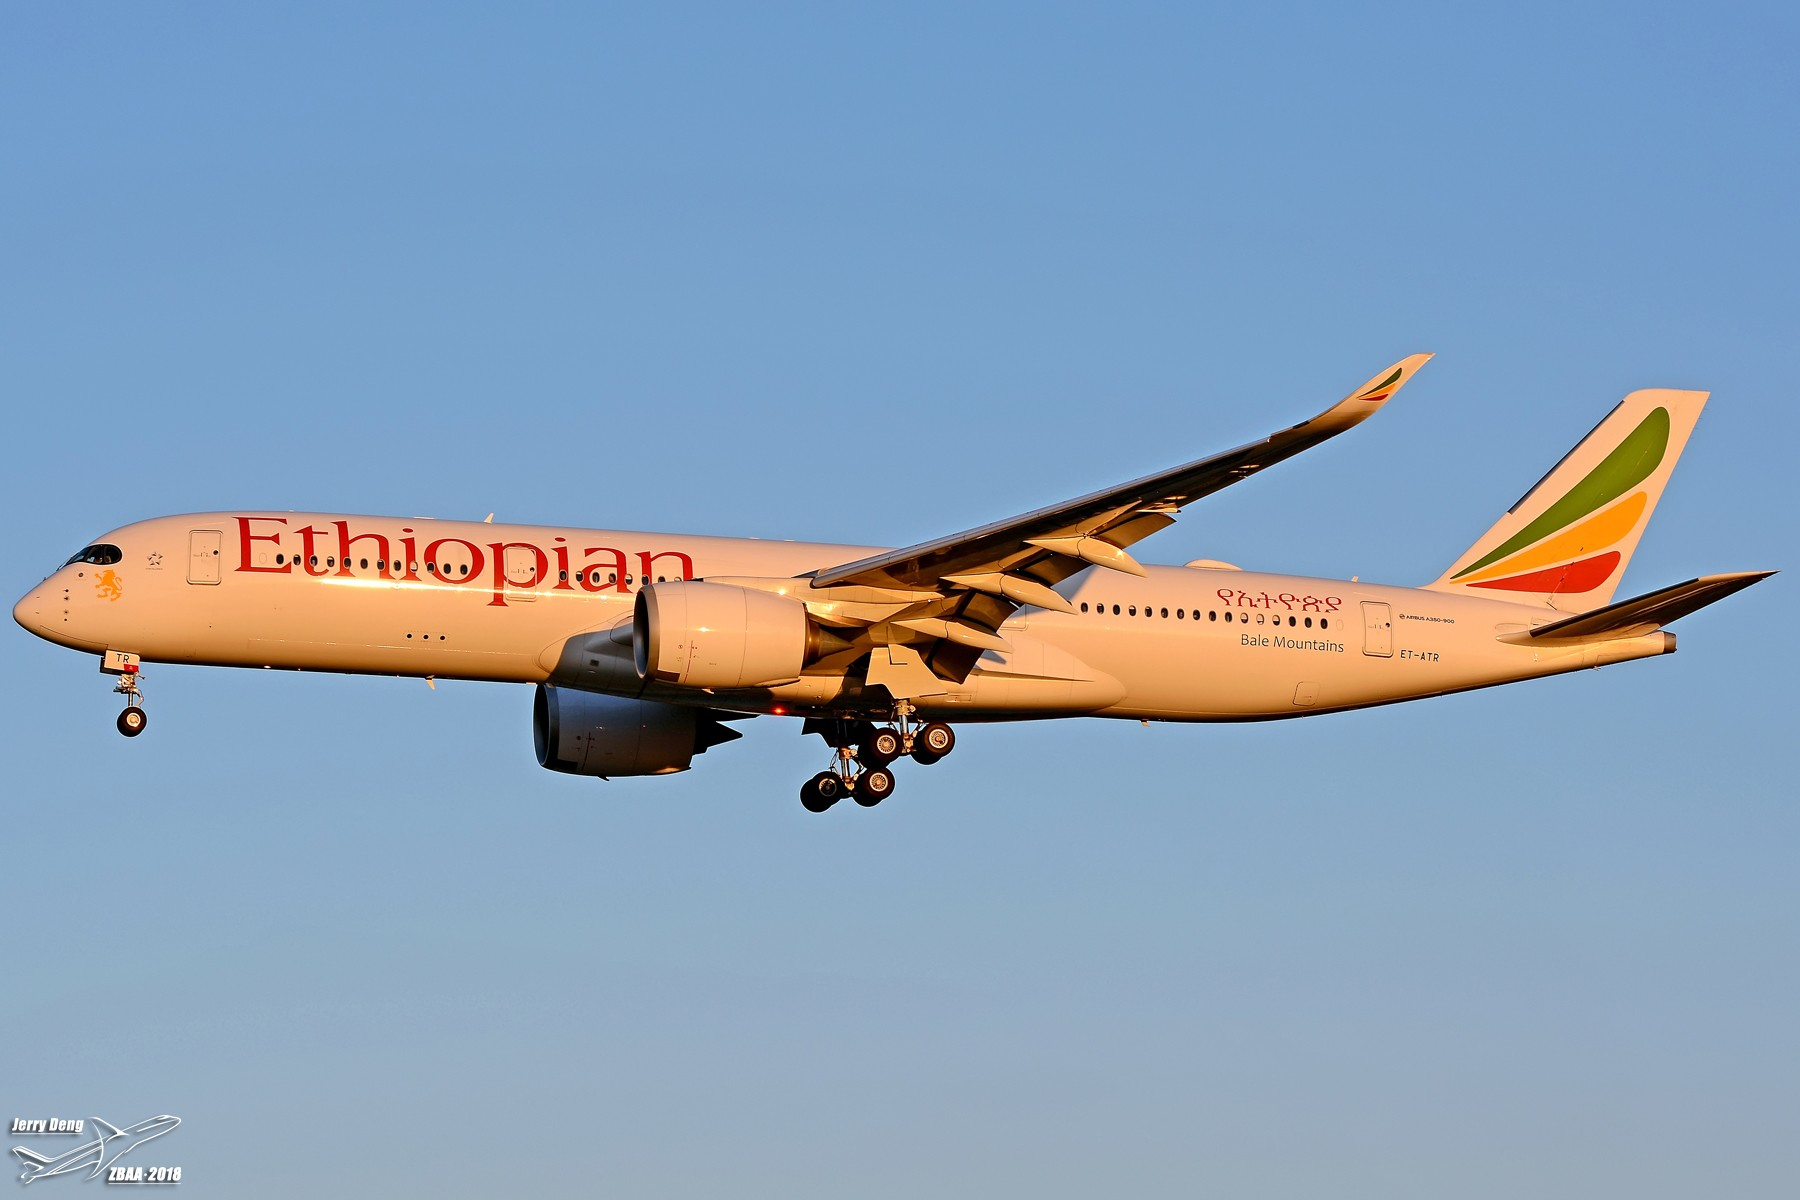 Re:[原创]【多图党】出差赶上天气不错ZBAA随拍 AIRBUS A350-900 ET-ATR 中国北京首都国际机场